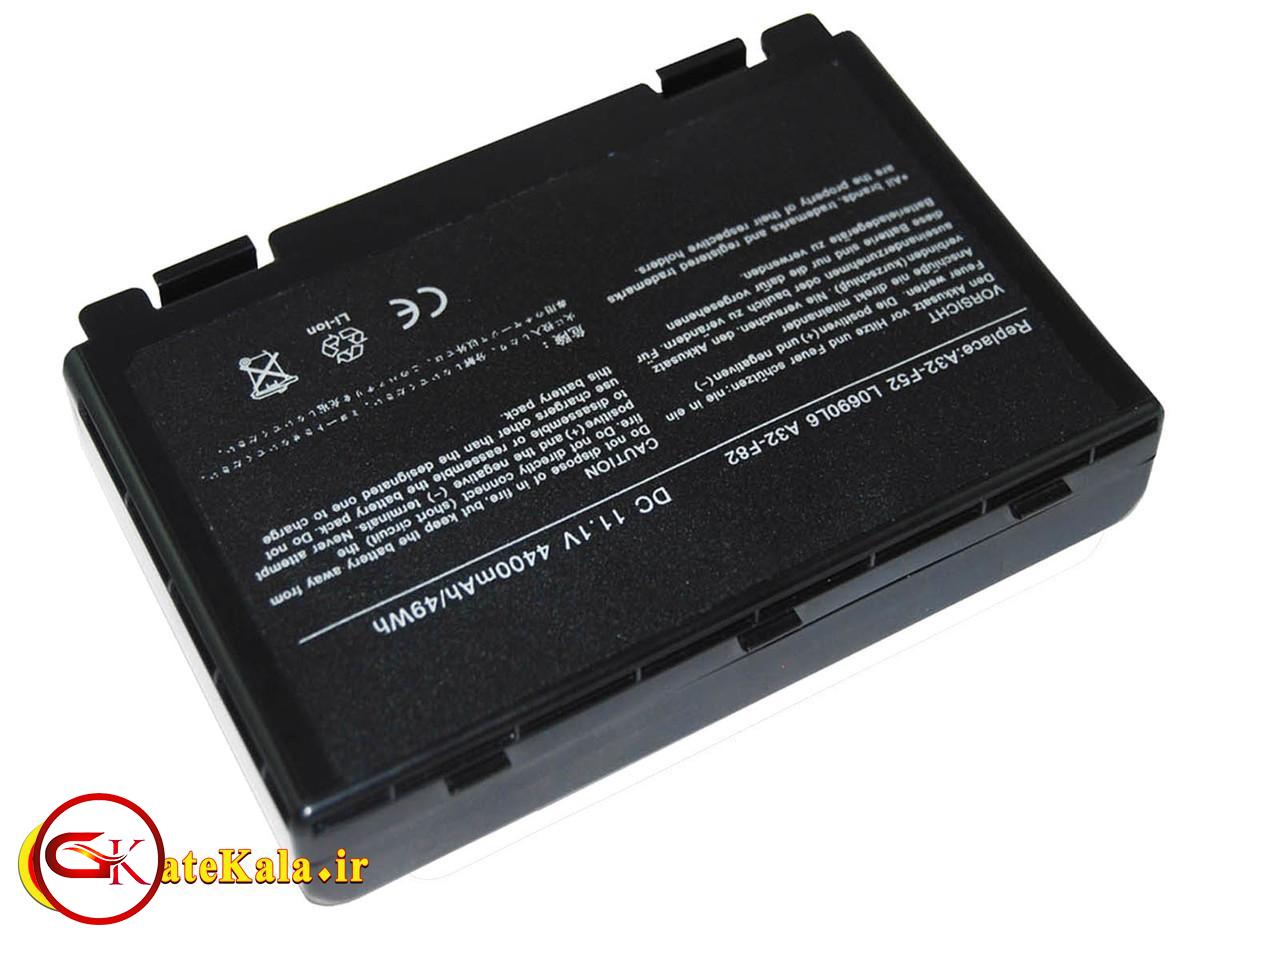 باتری شش سلولی لپ تاپ ایسوس Asus X70